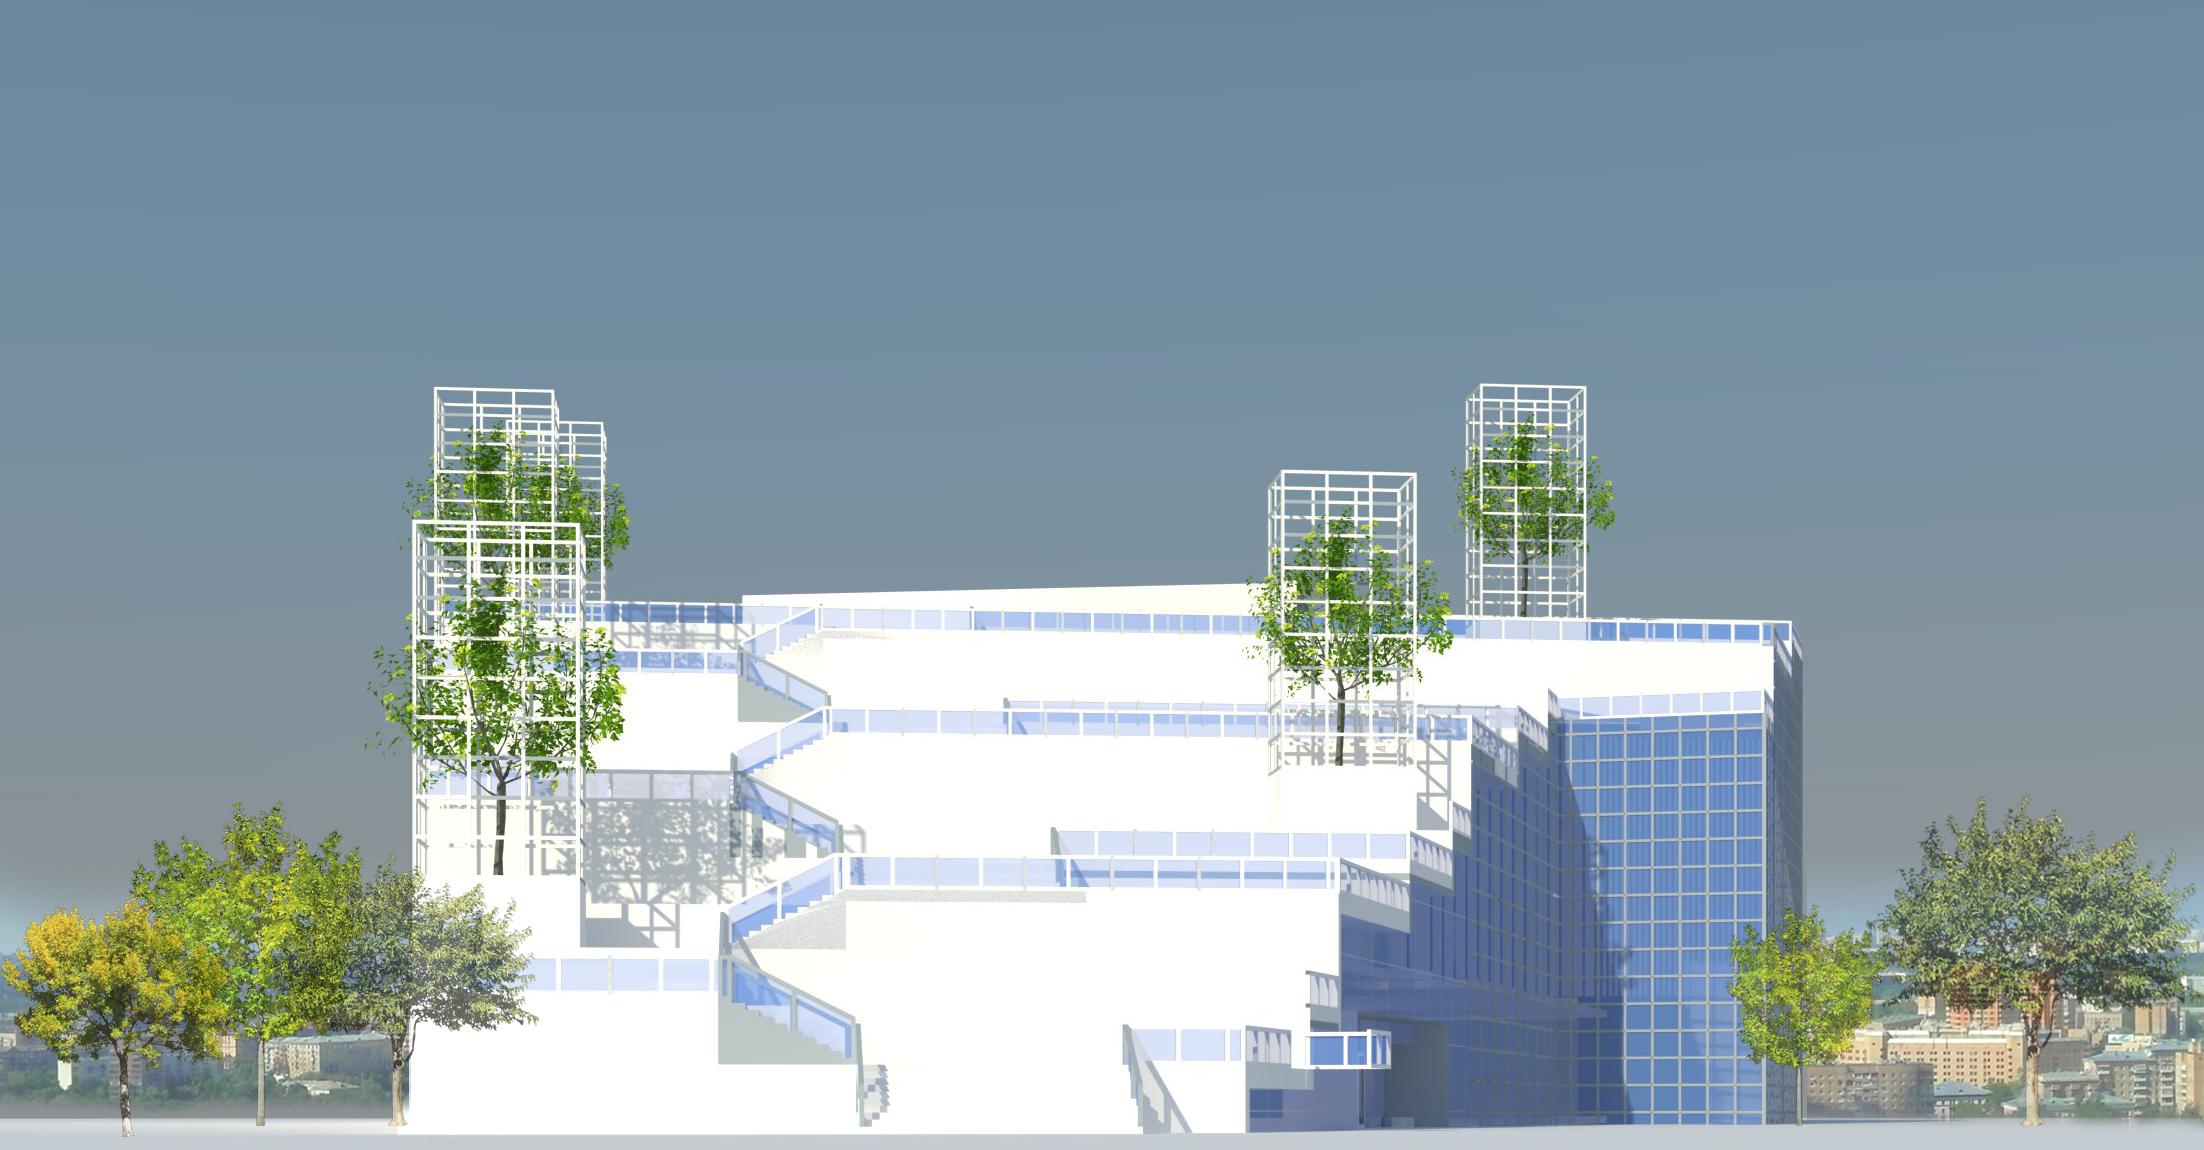 Разработка архитектурной концепции театра оперы и балета фото f_89852f0ce69adc56.jpg